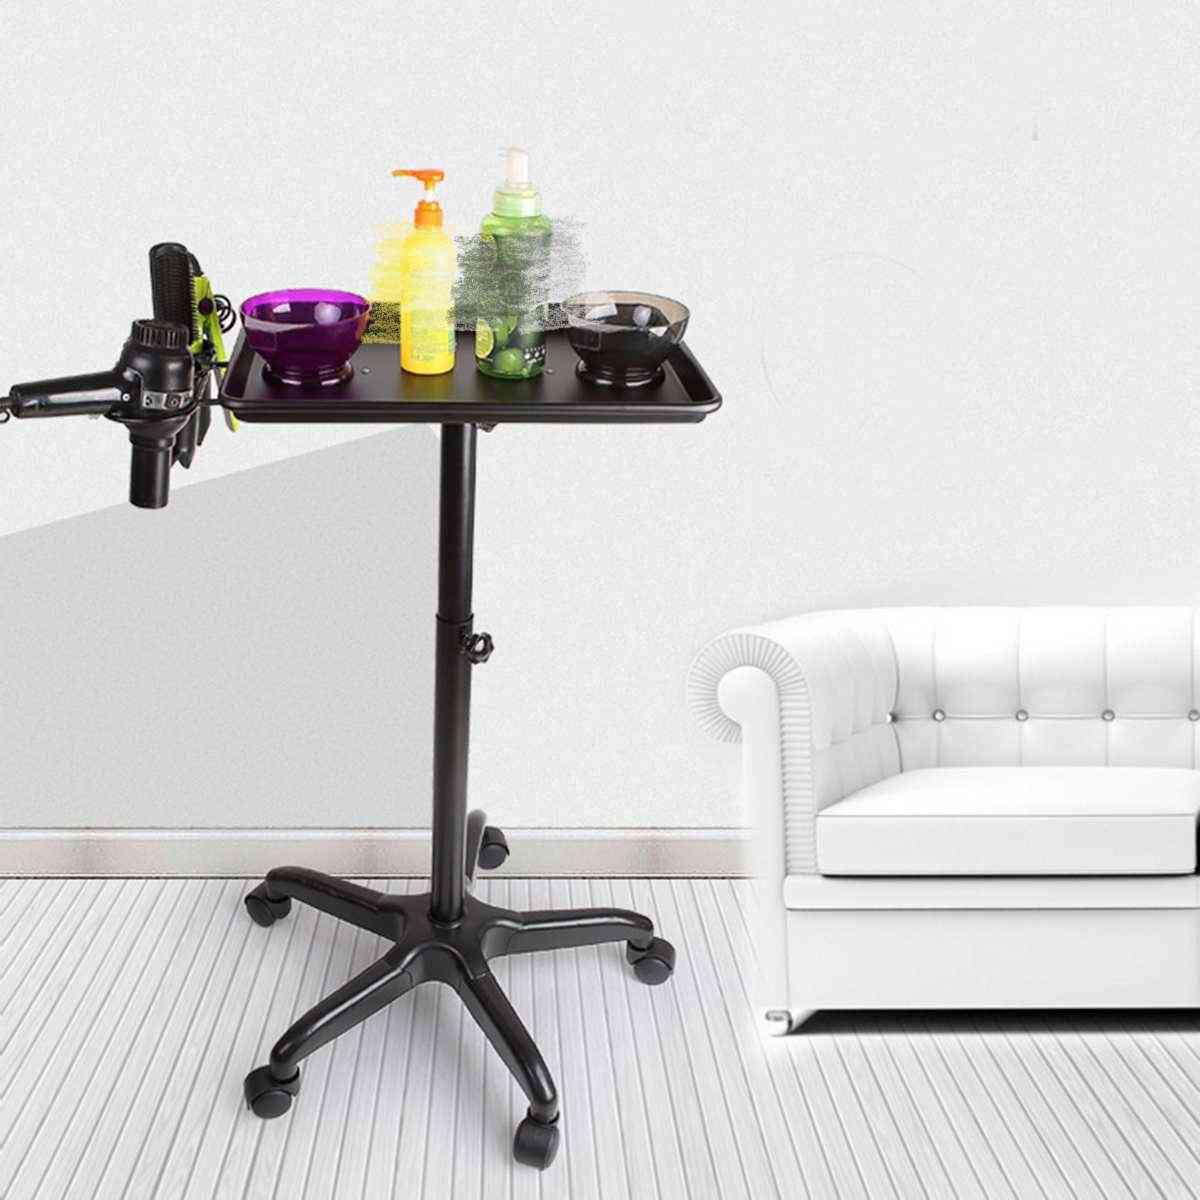 Hairdresser Beauty Trolley Cart, Hair Styling Equipment Holder Stand For Salon